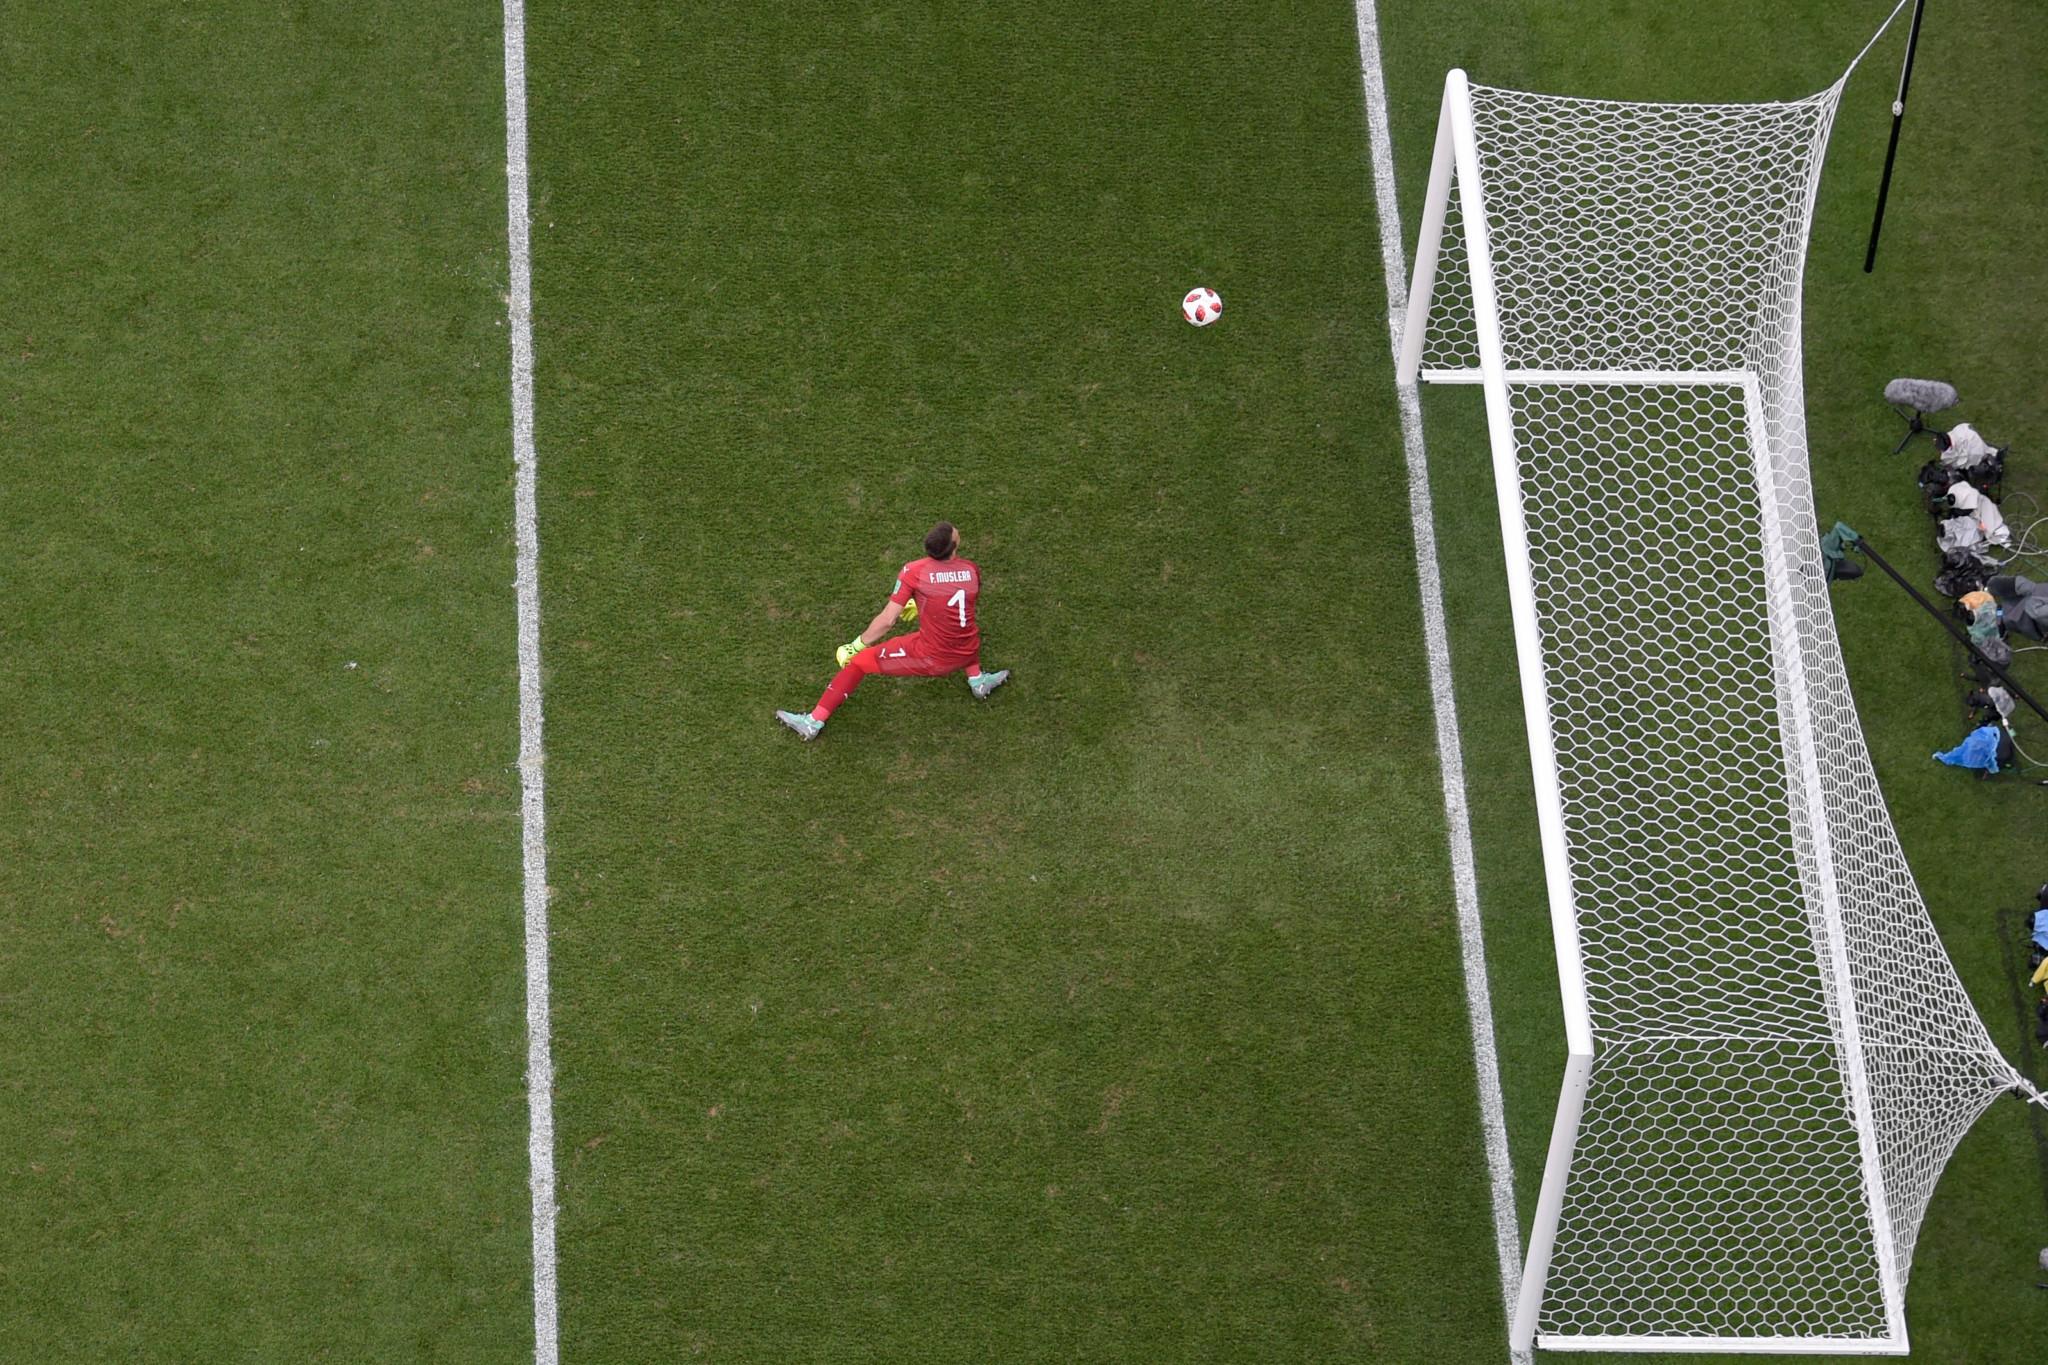 An error by Uruguay goalkeeper Fernando Muslera handed France their second goal ©Getty Images